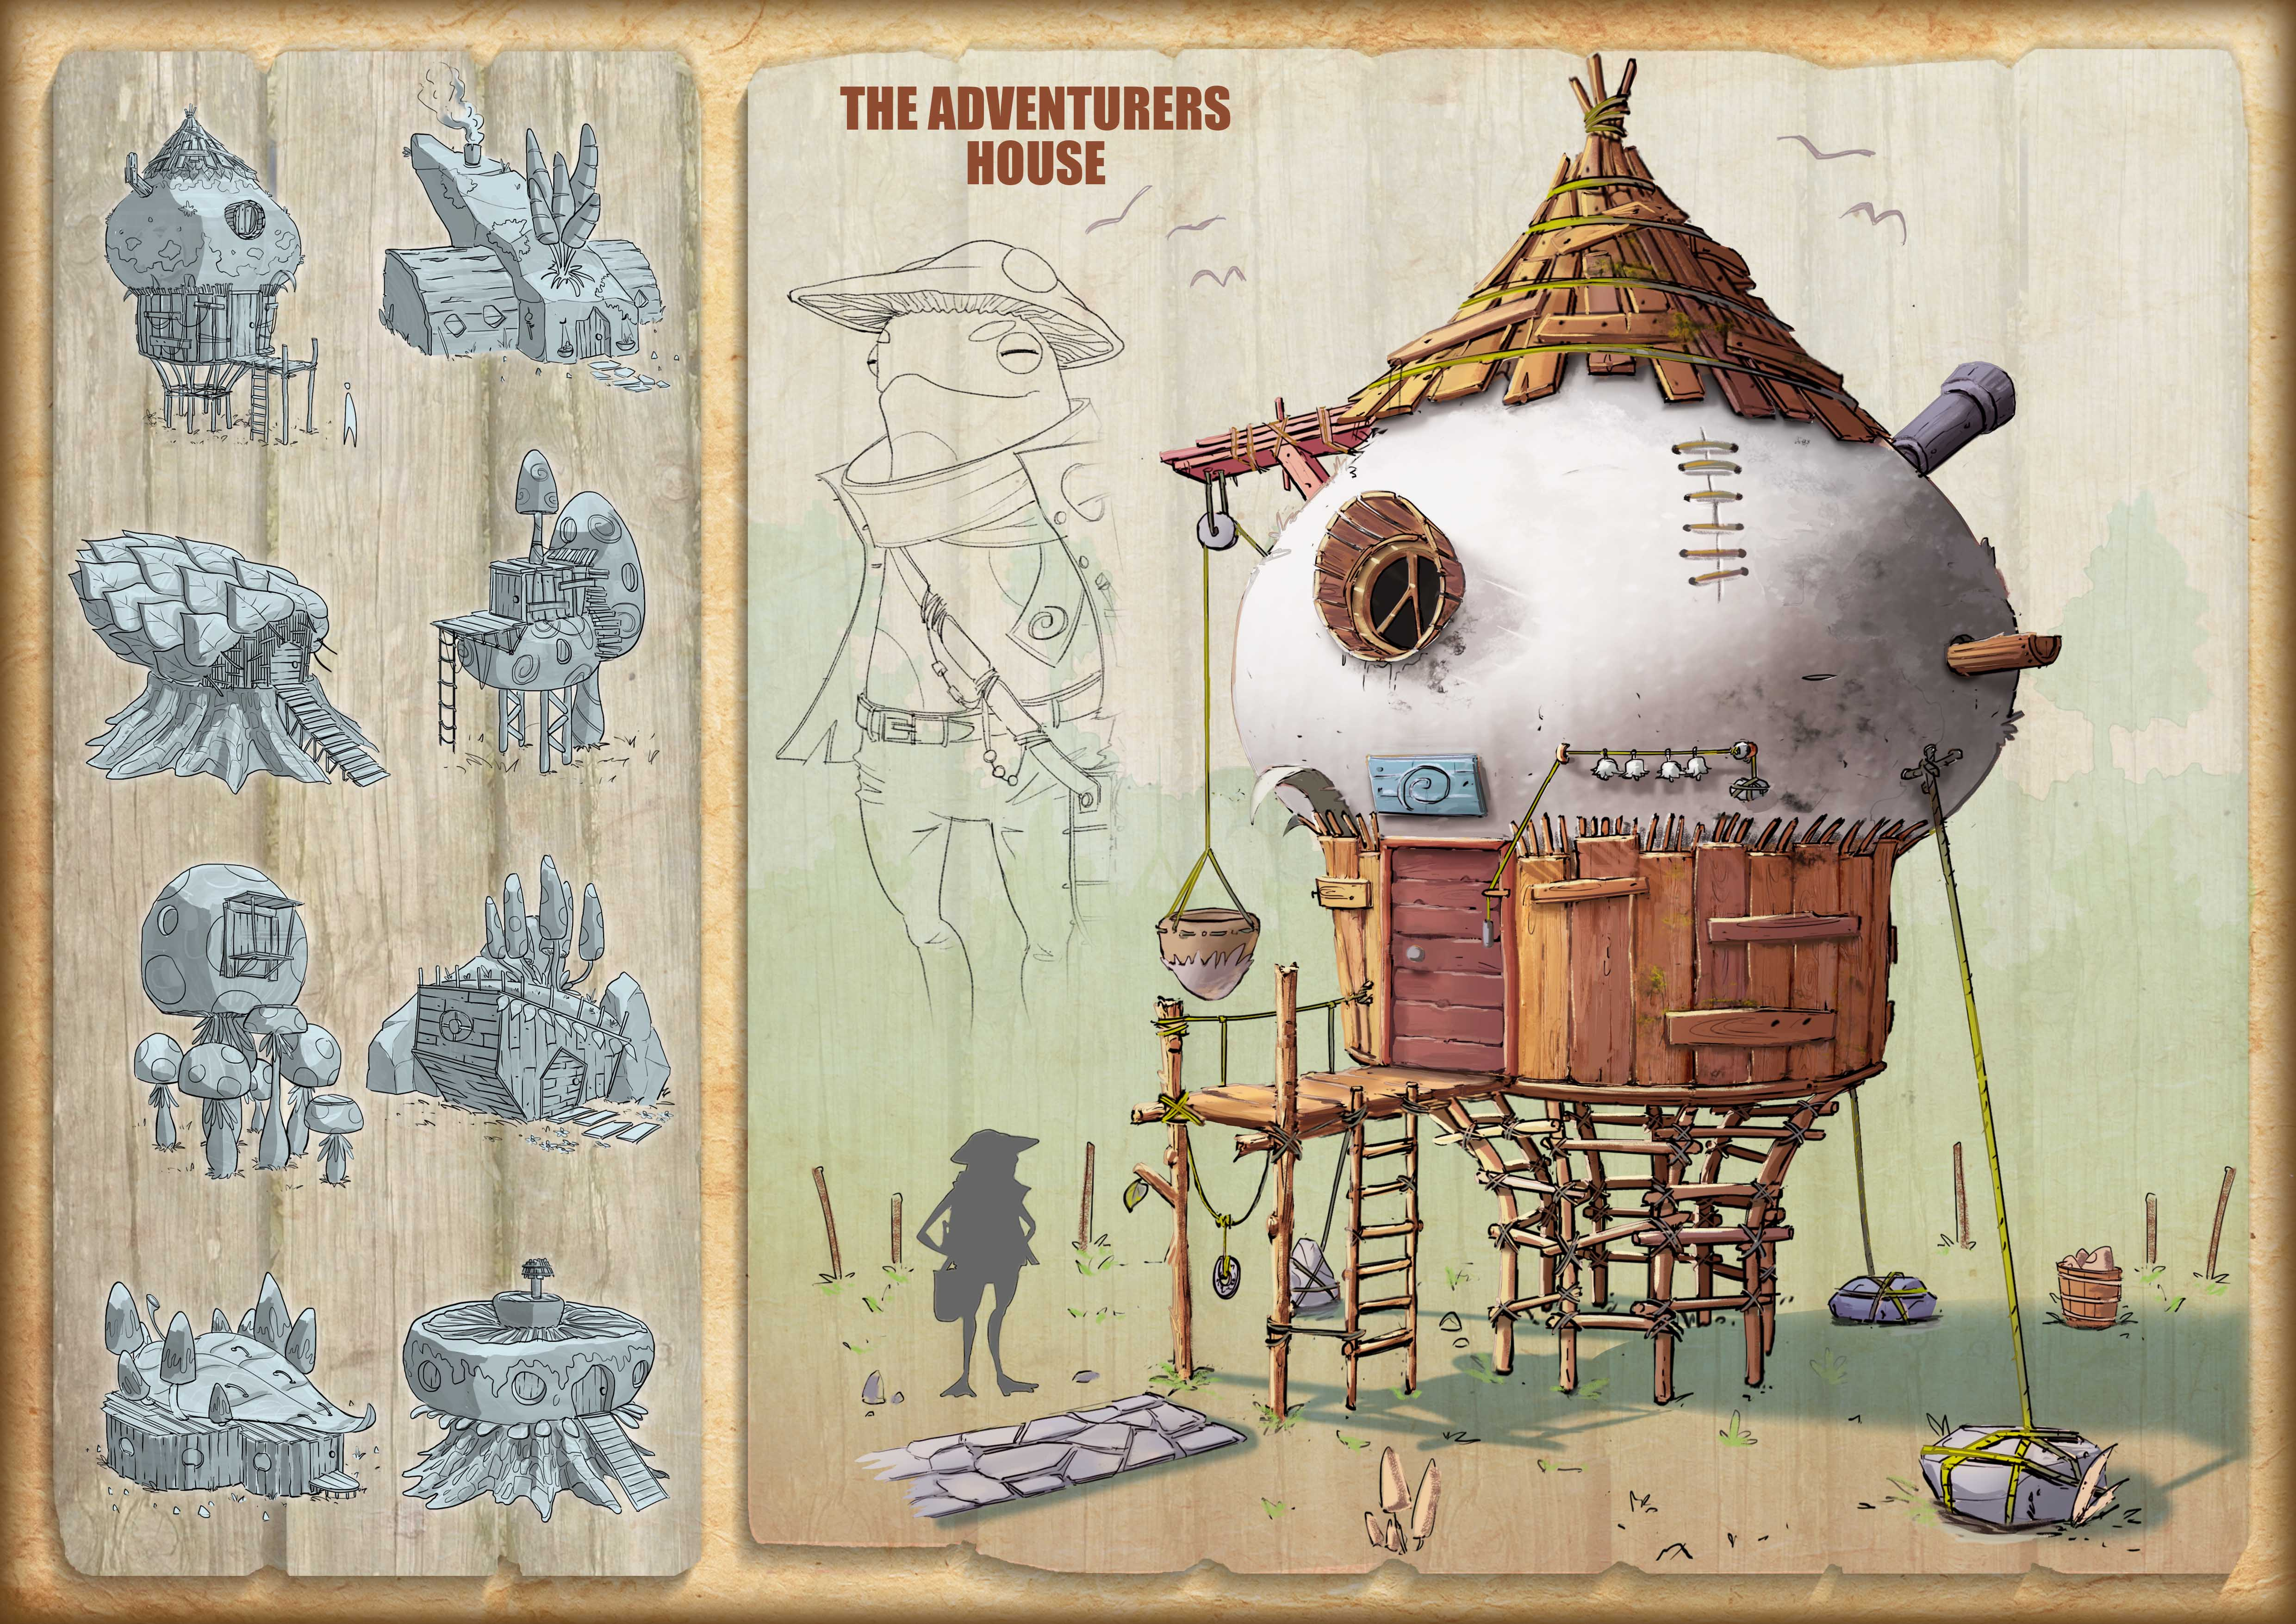 The Adventurer's house